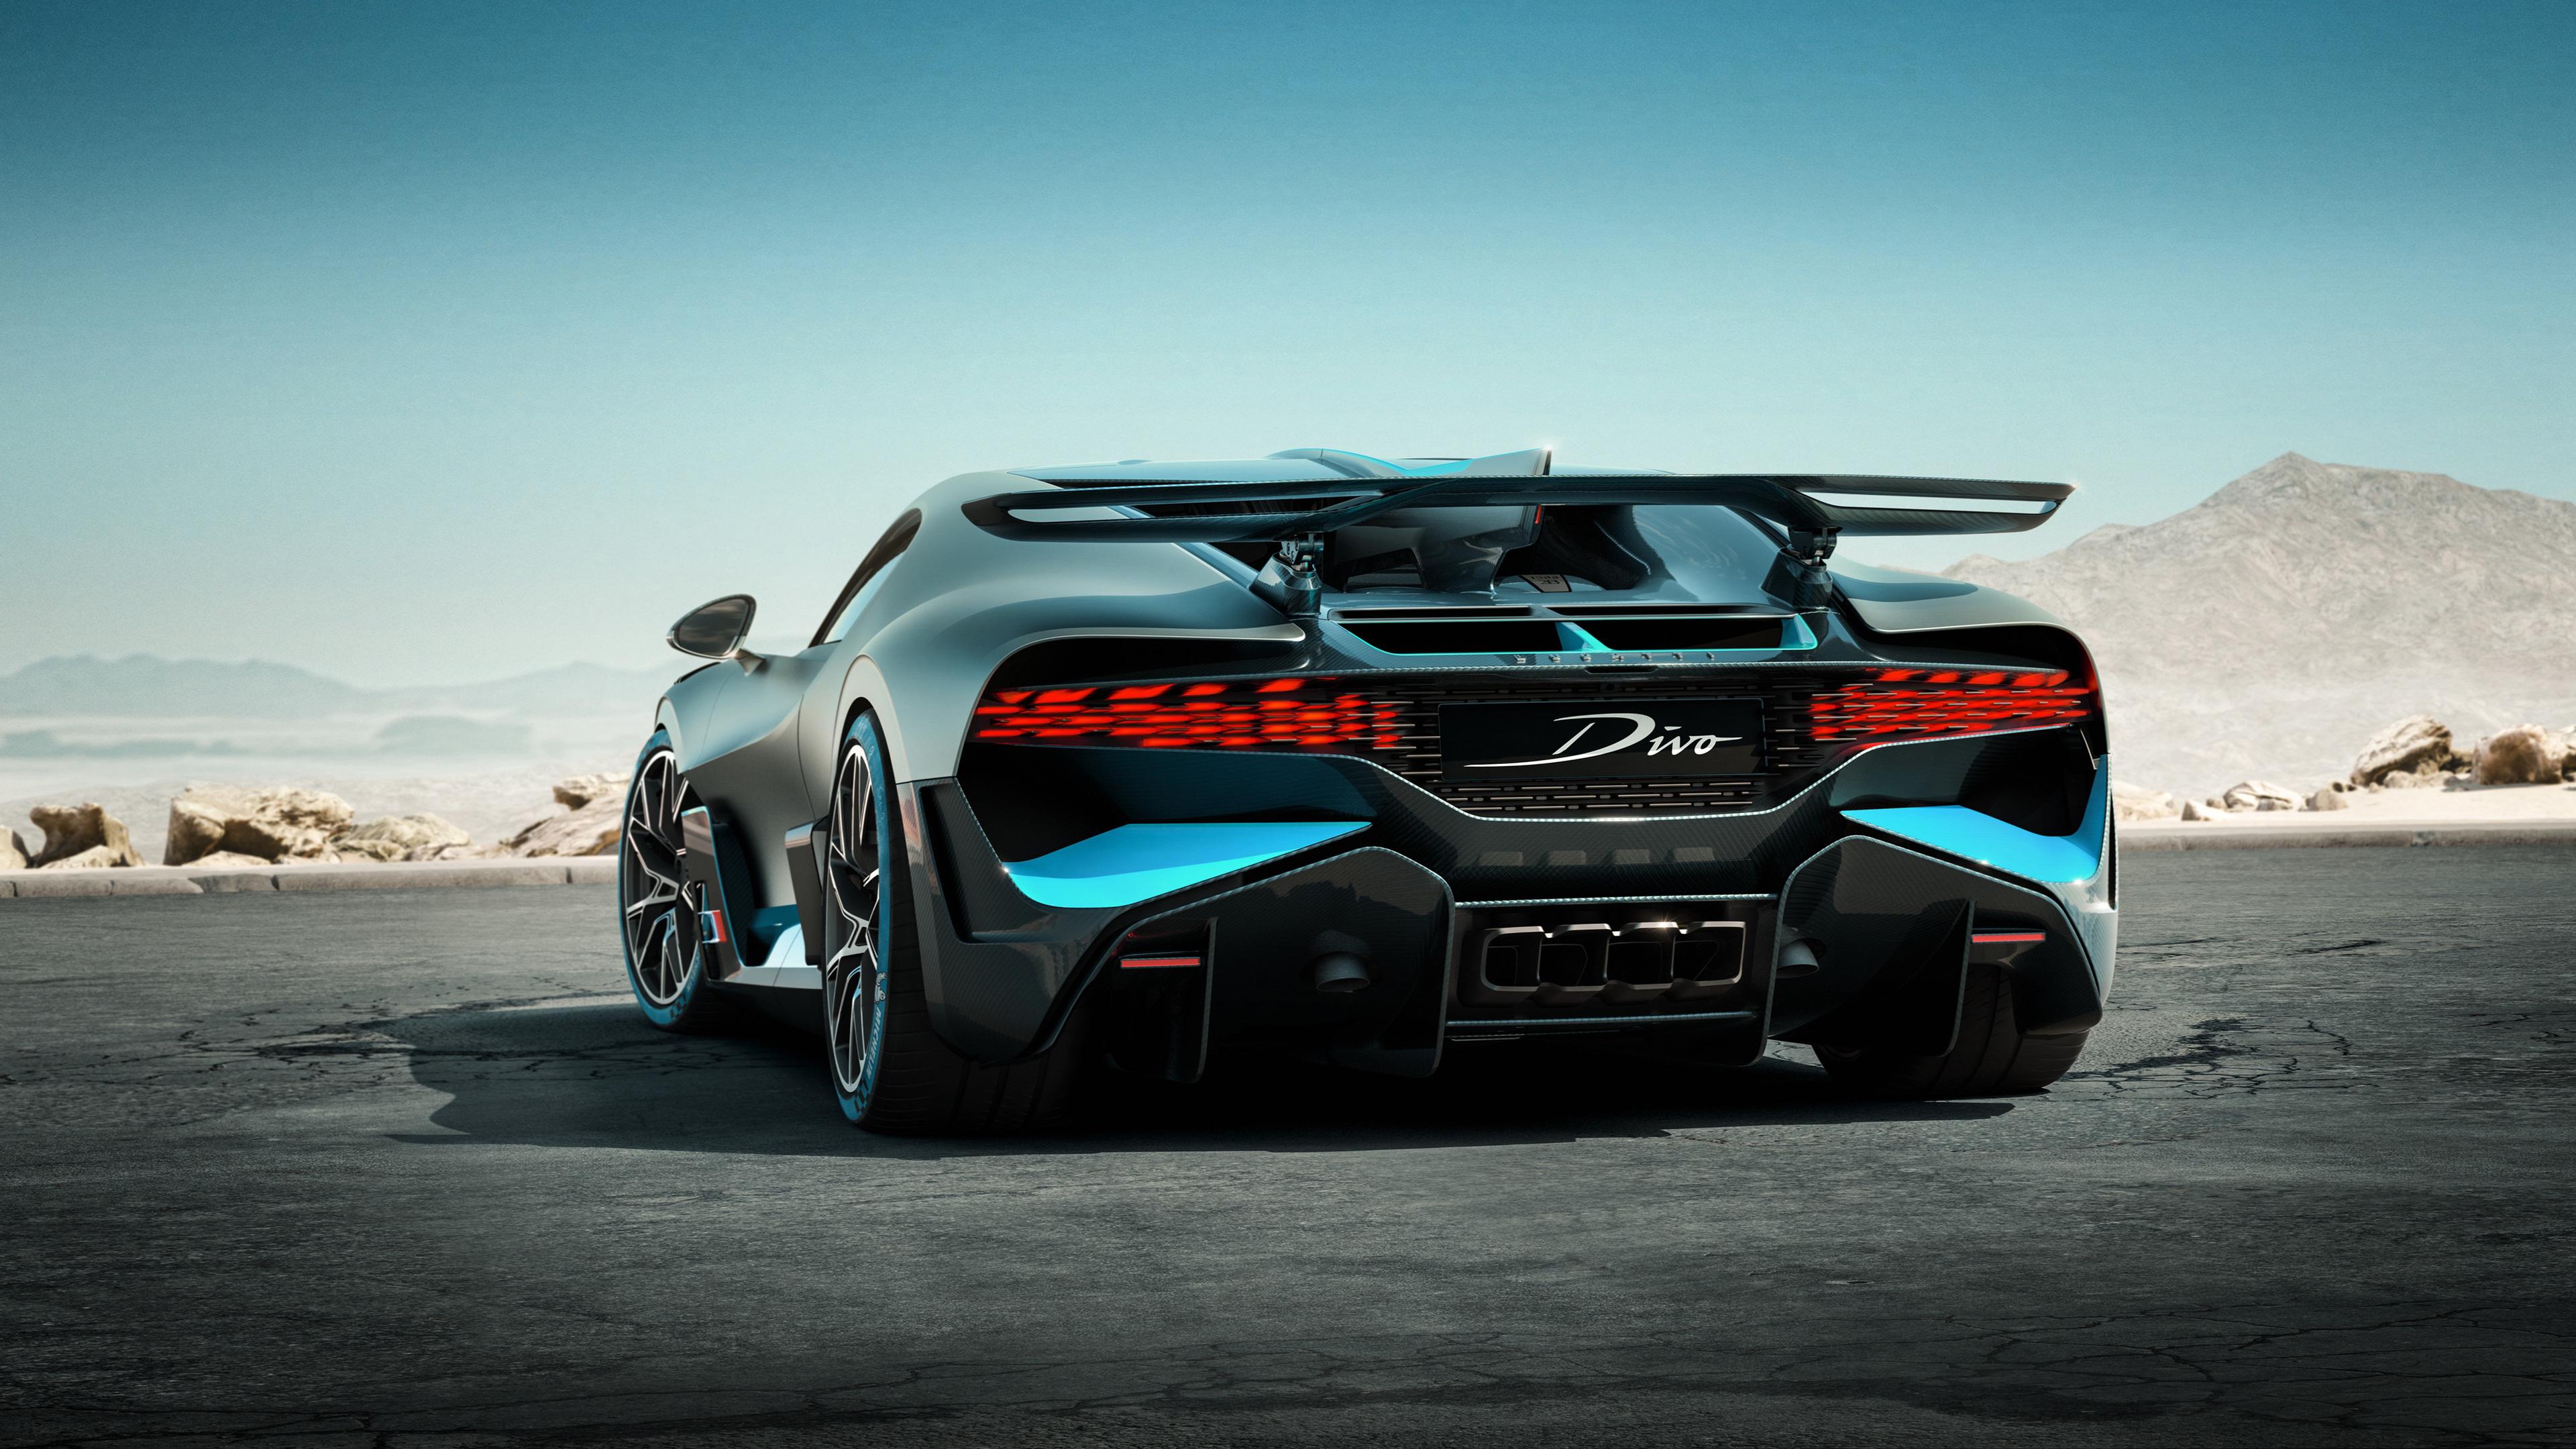 2018 bugatti divo rear 1539114243 - 2018 Bugatti Divo Rear - hd-wallpapers, cars wallpapers, bugatti wallpapers, bugatti divo wallpapers, 4k-wallpapers, 2018 cars wallpapers